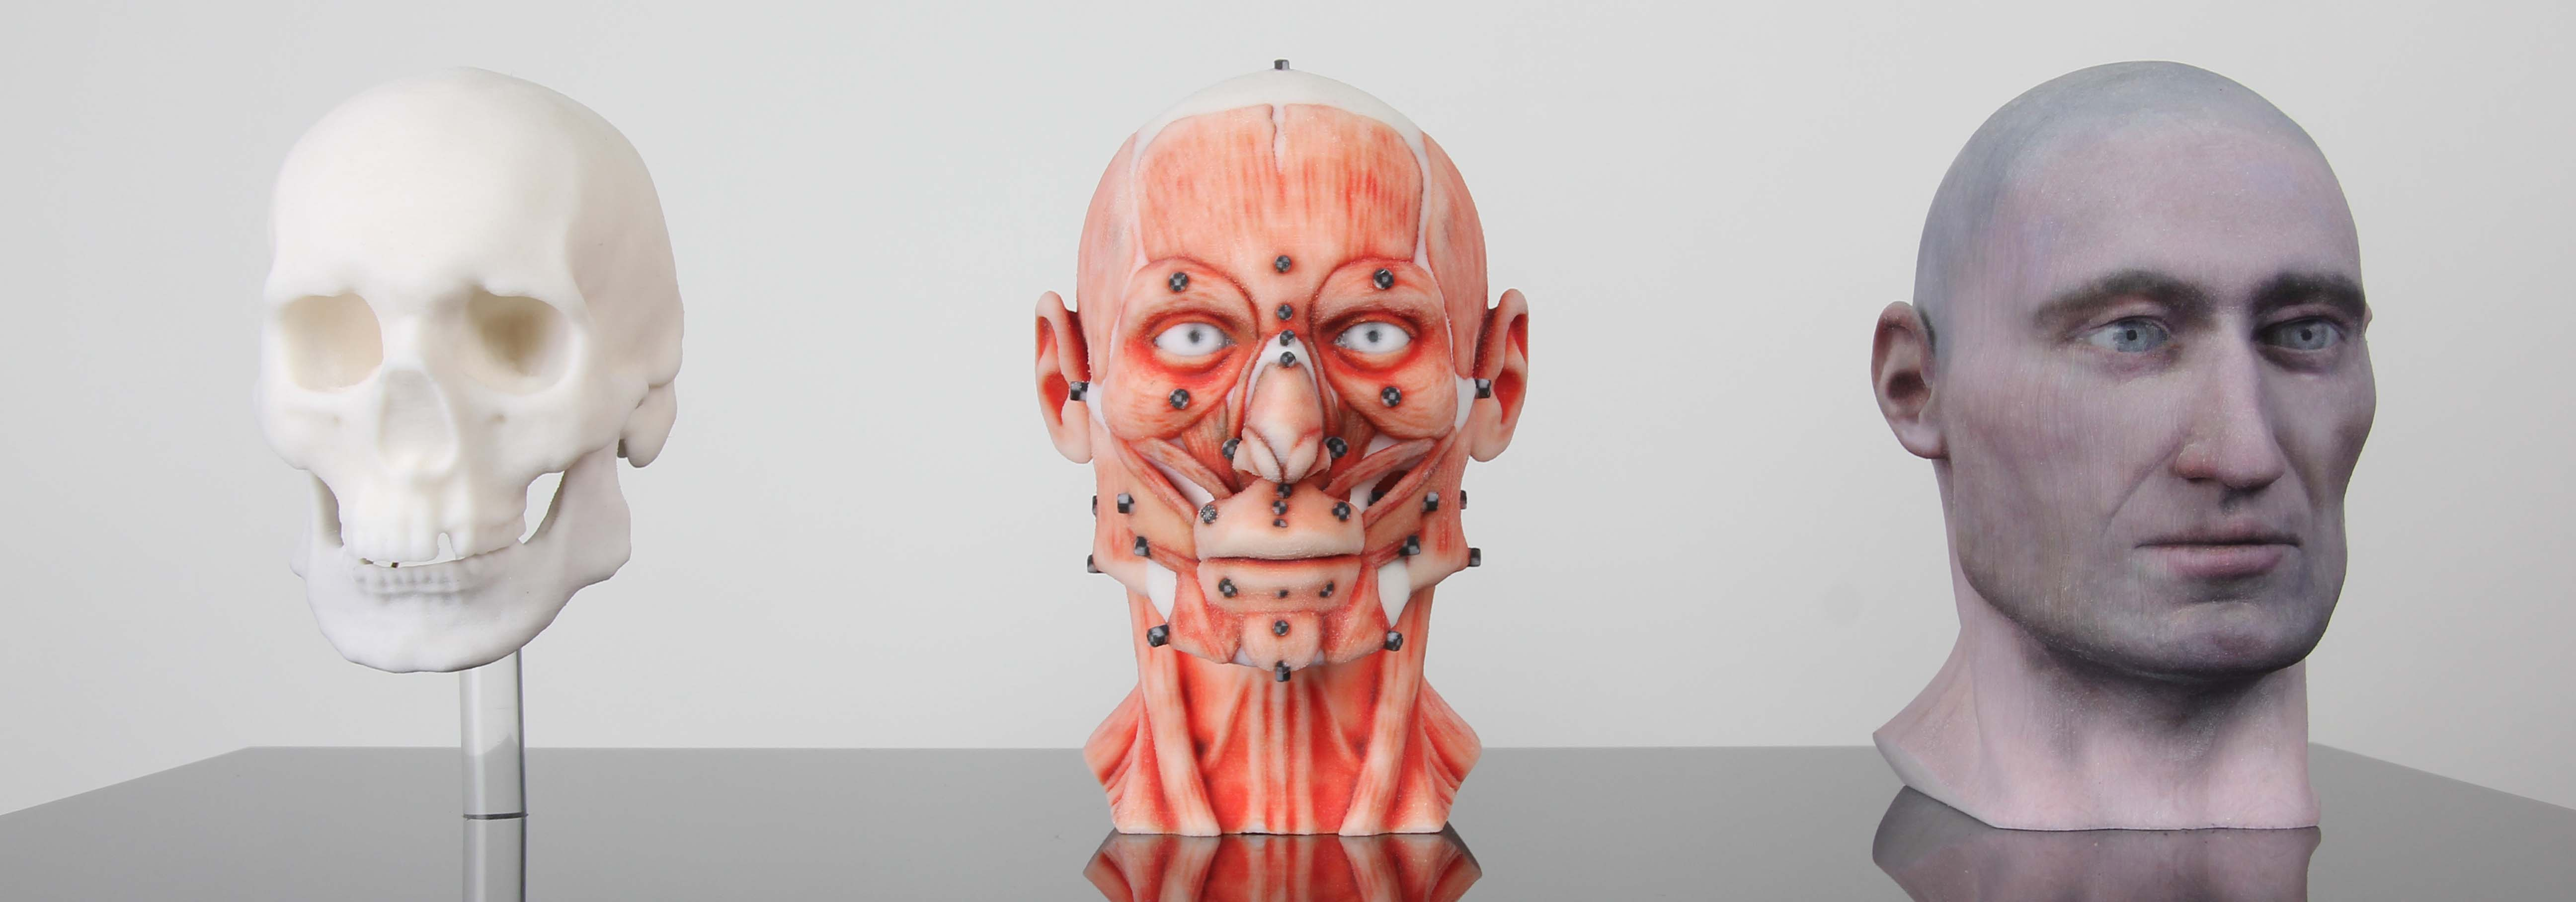 Cranial Facial Reconstruction European Male Facial Muscle 3d Model